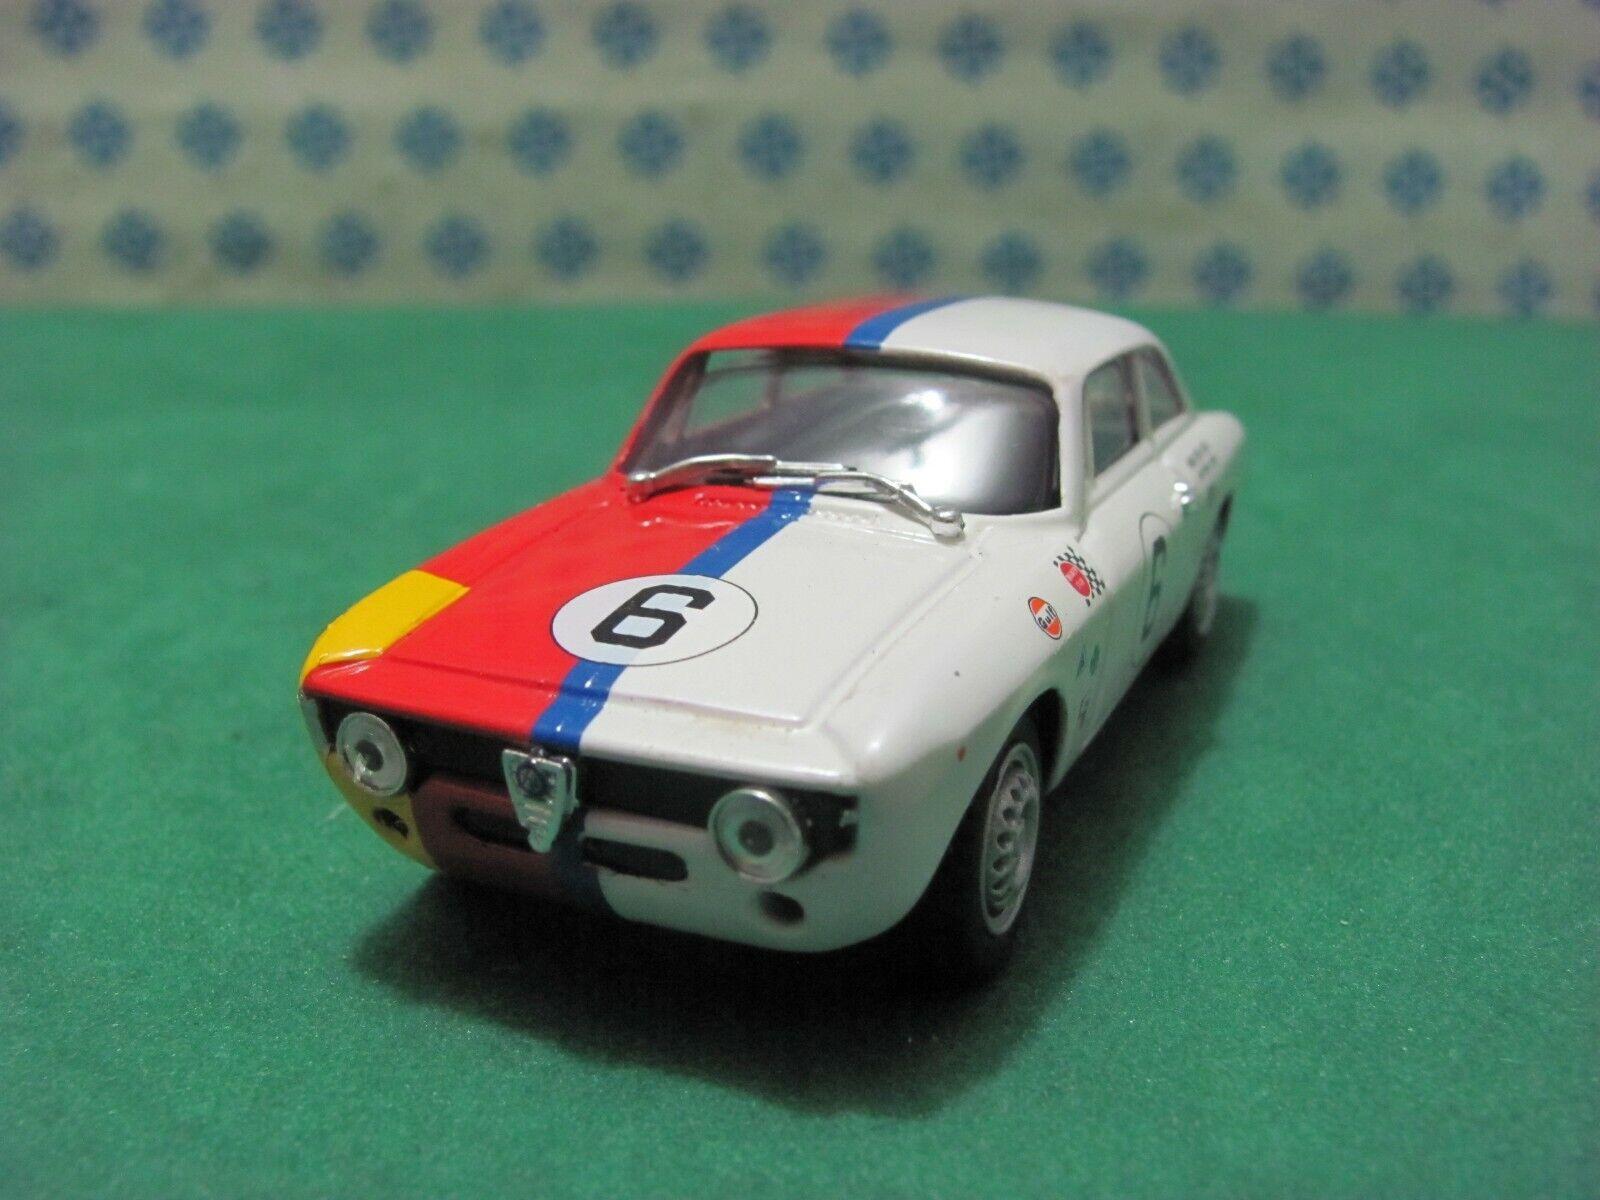 Alpha Romeo Giulia GTA 1600 palanquín cruzando am 1967 - 1   43 progetto K 2061a